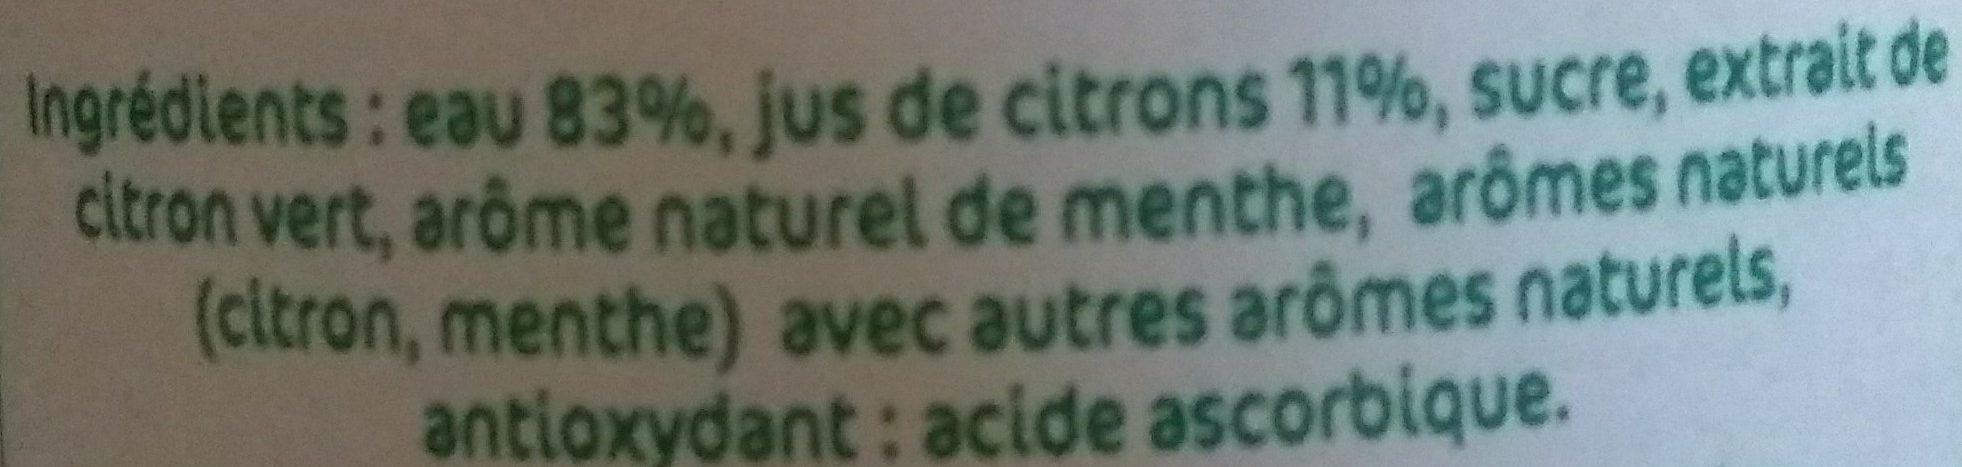 Citronade à la menthe - Ingrediënten